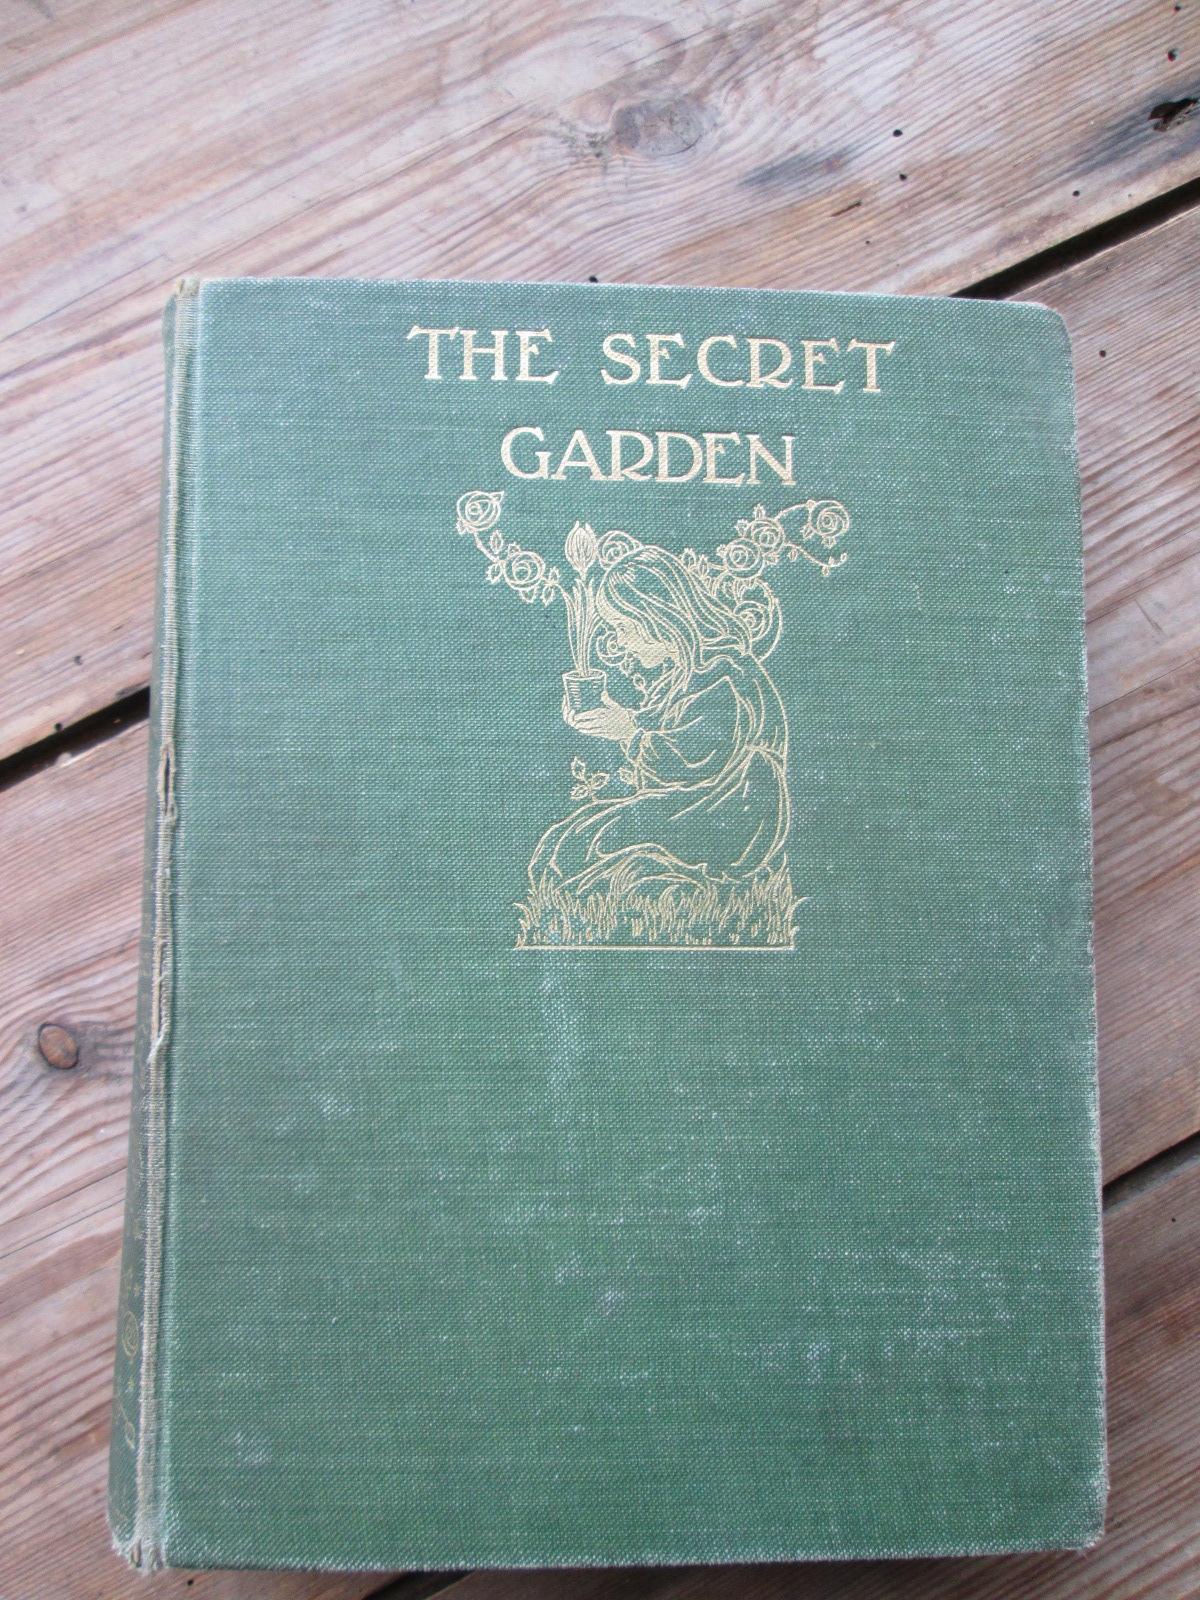 Withnail Books The Secret Garden First Edition